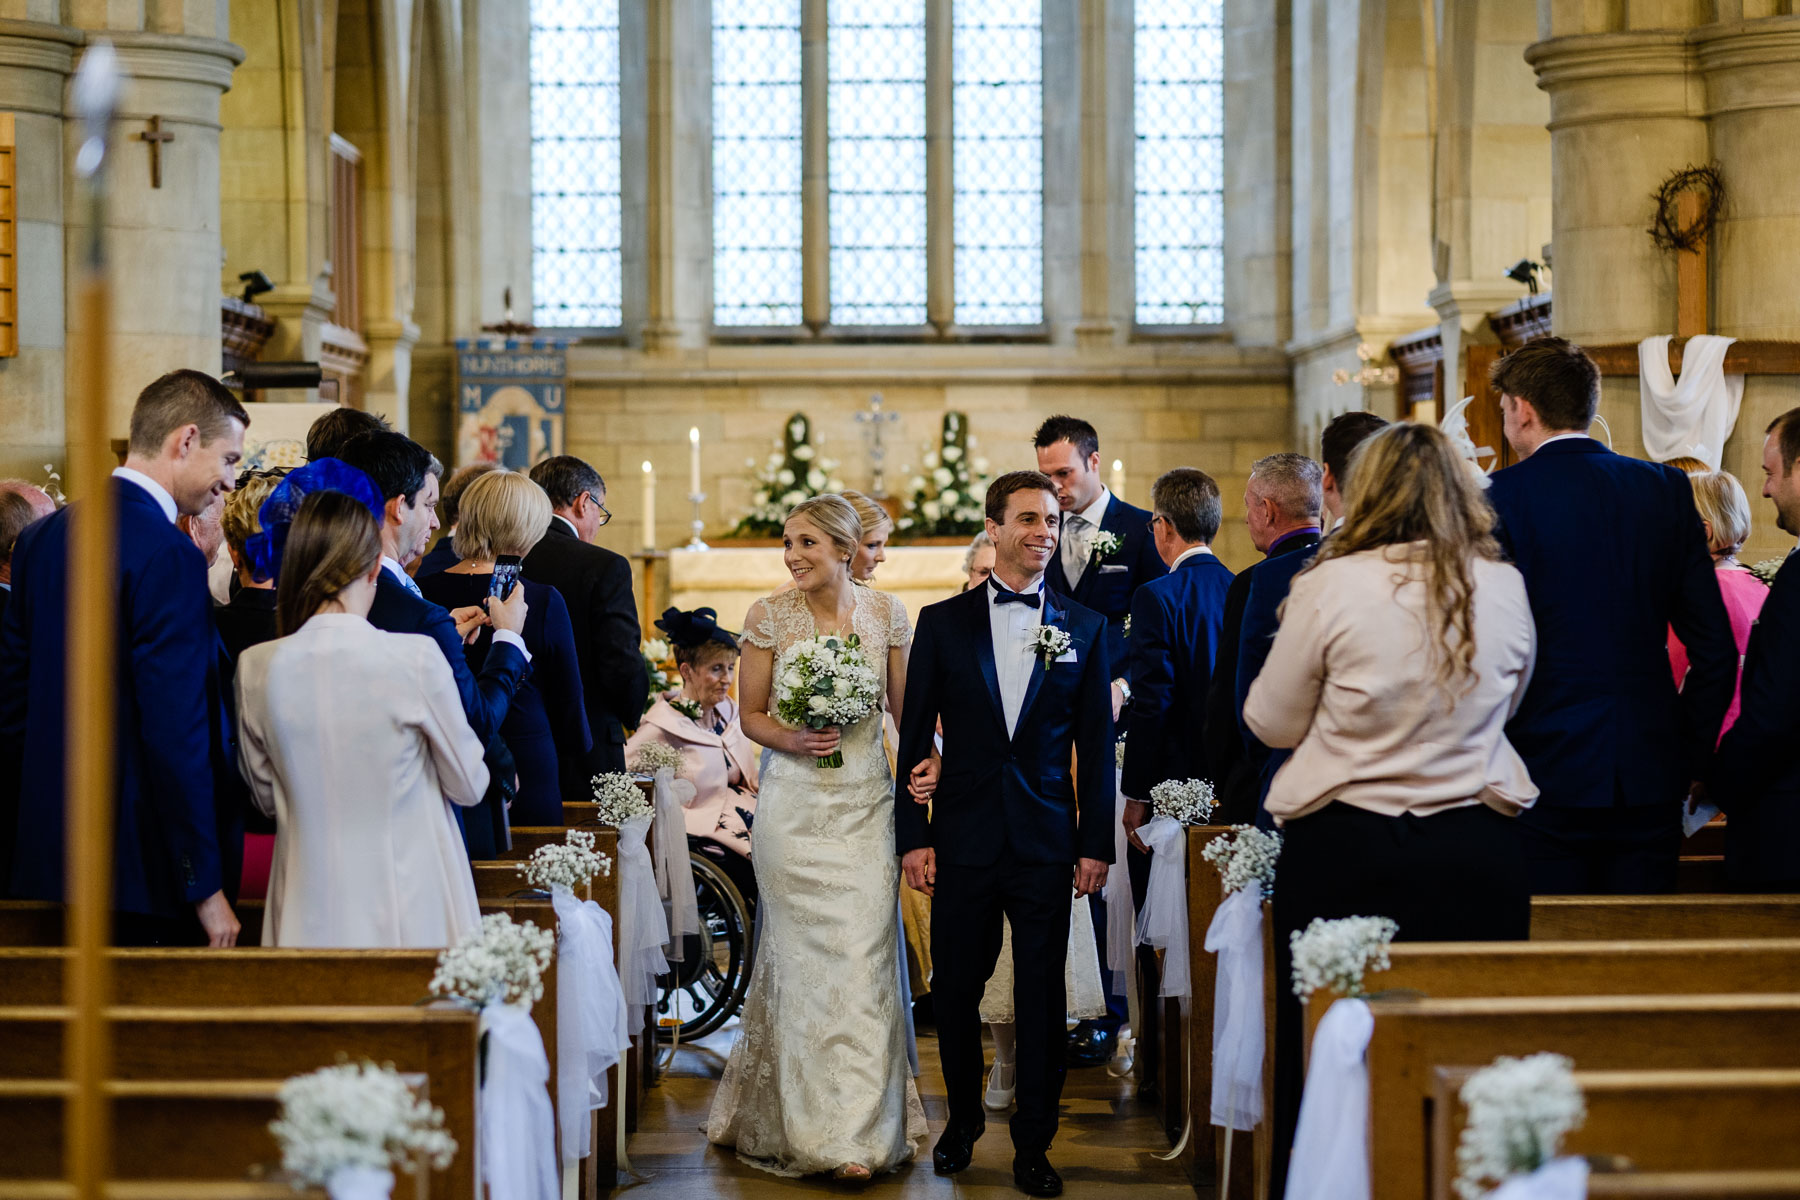 Crathorne Hall Wedding Photography - Jo & Paul (114).jpg